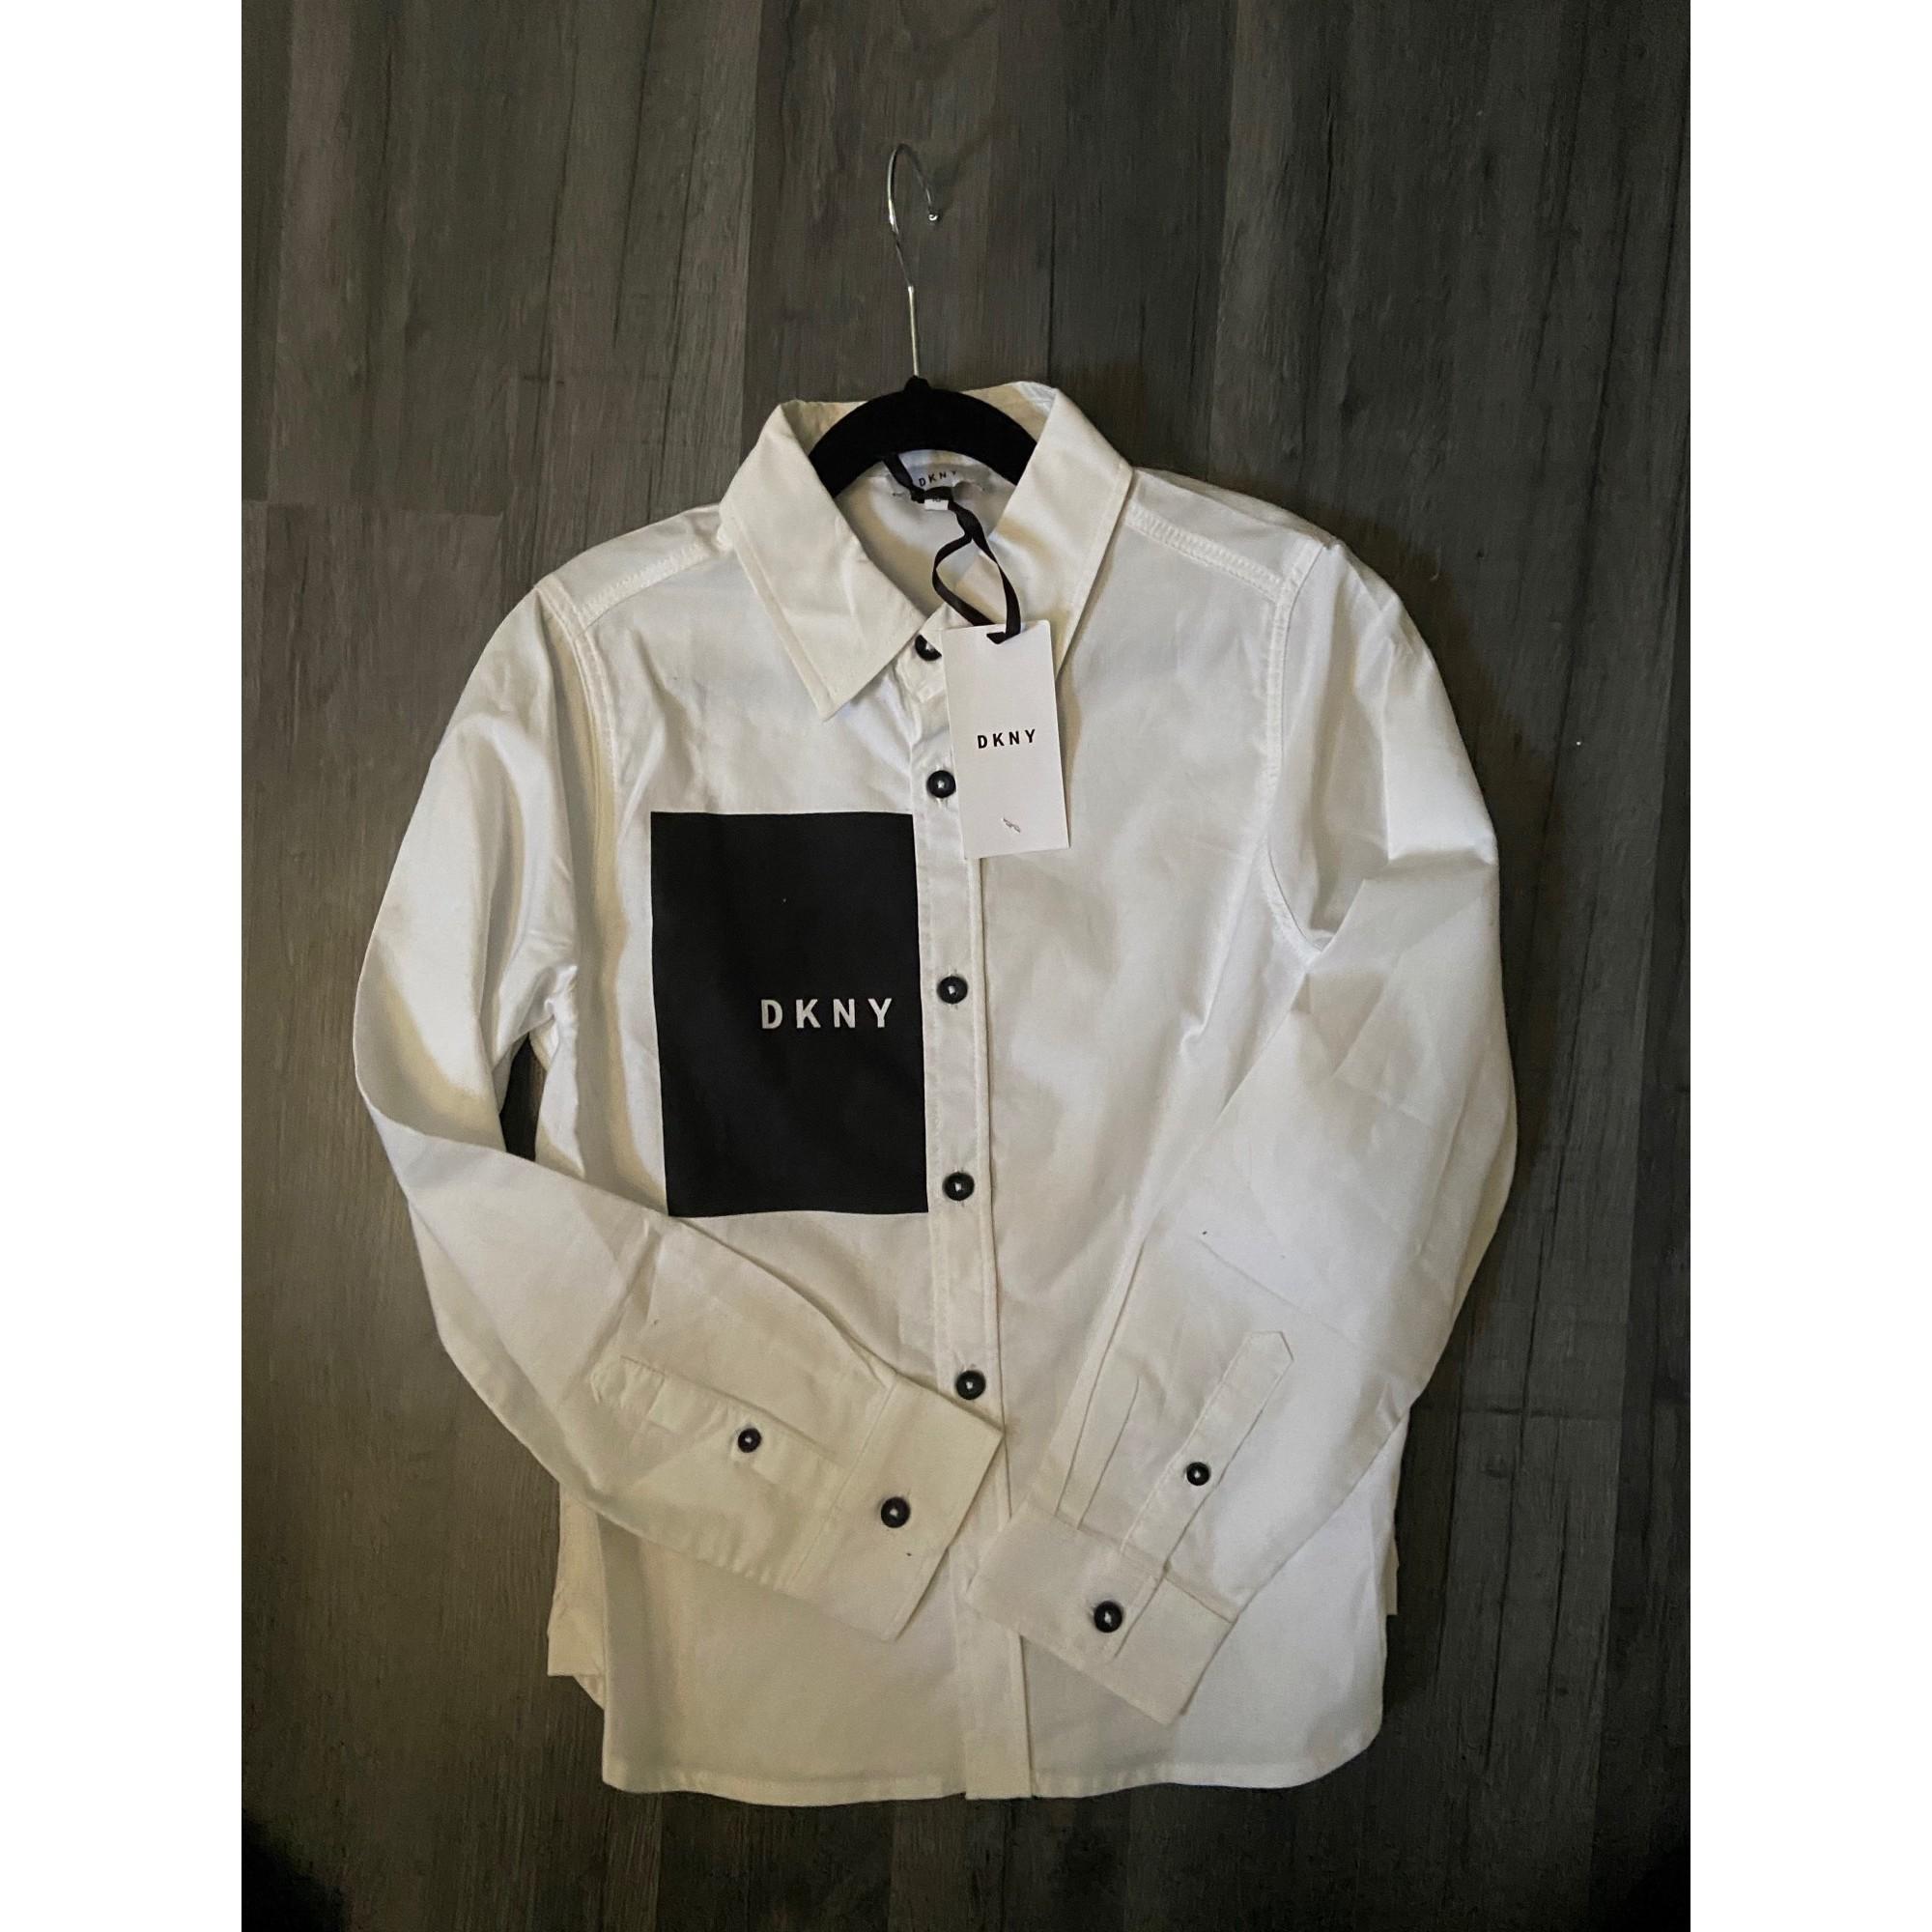 Chemise DKNY Blanc, blanc cassé, écru